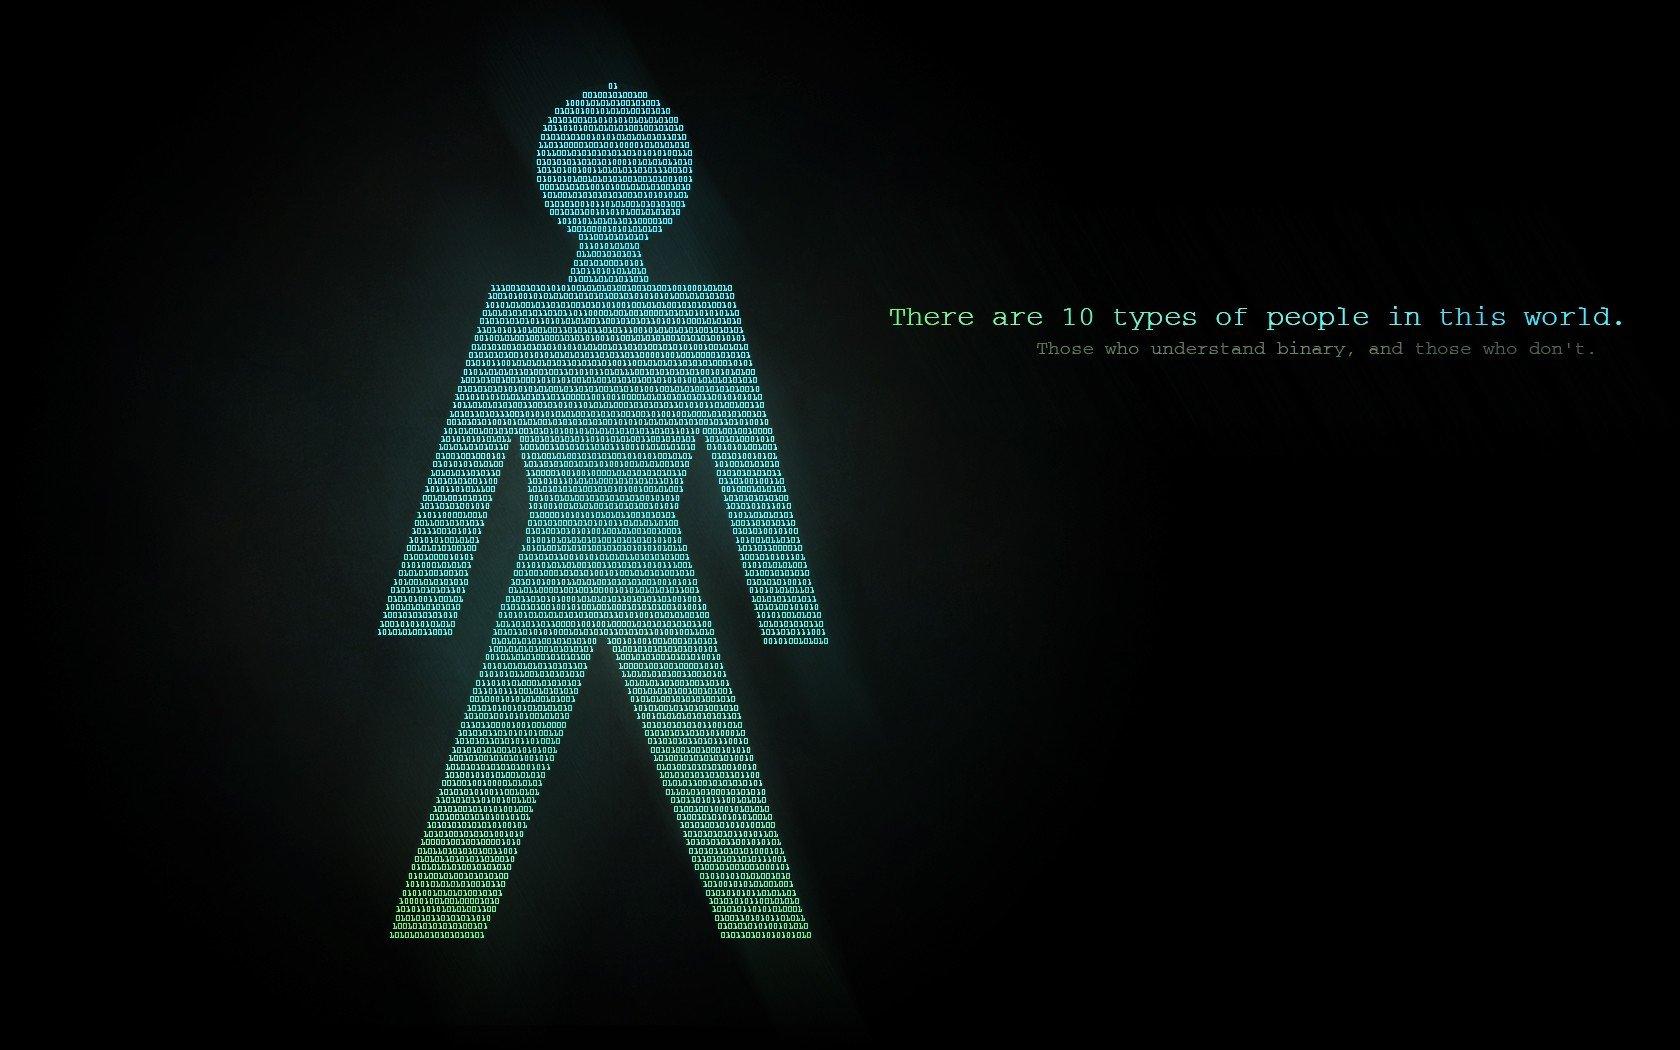 Computers nerd technology binary jokes cypher66 wallpaper computers nerd technology binary jokes cypher66 wallpaper 1680x1050 264029 wallpaperup voltagebd Choice Image